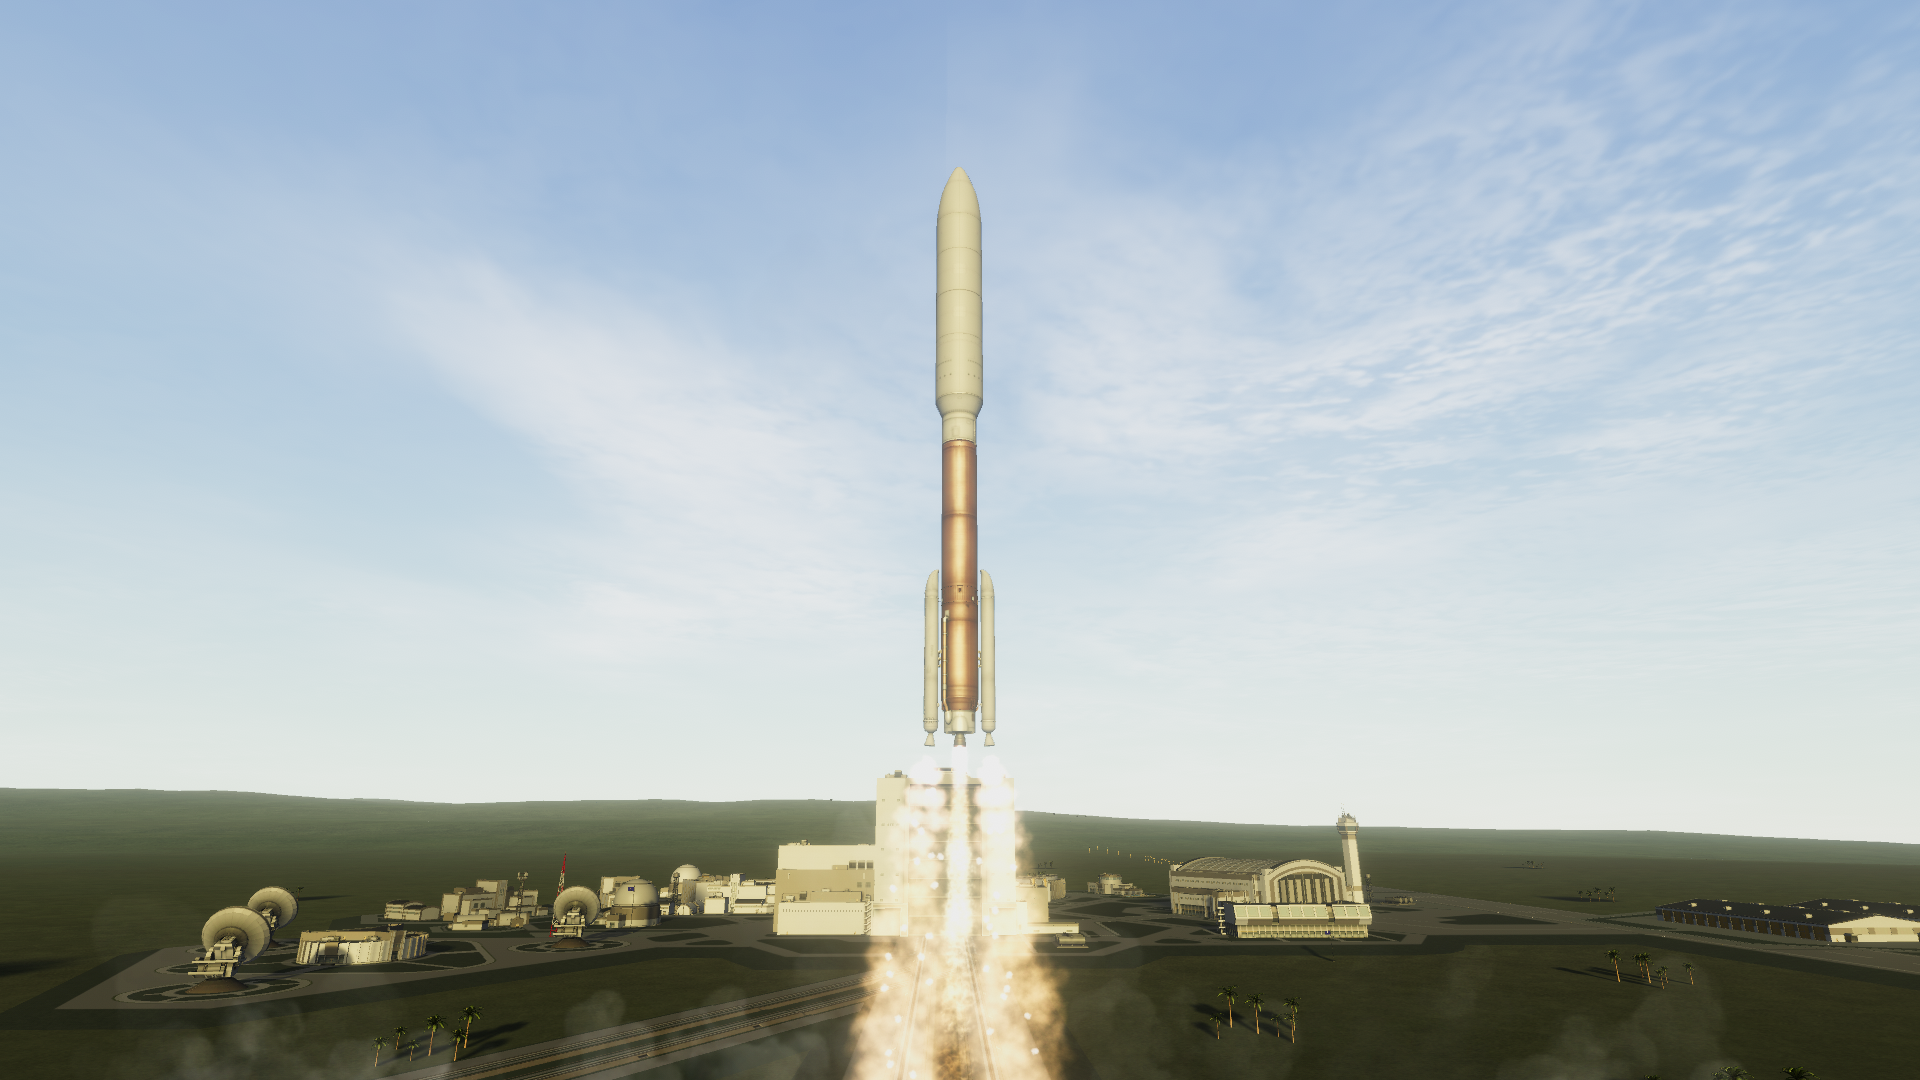 KSS2-M1-1.png